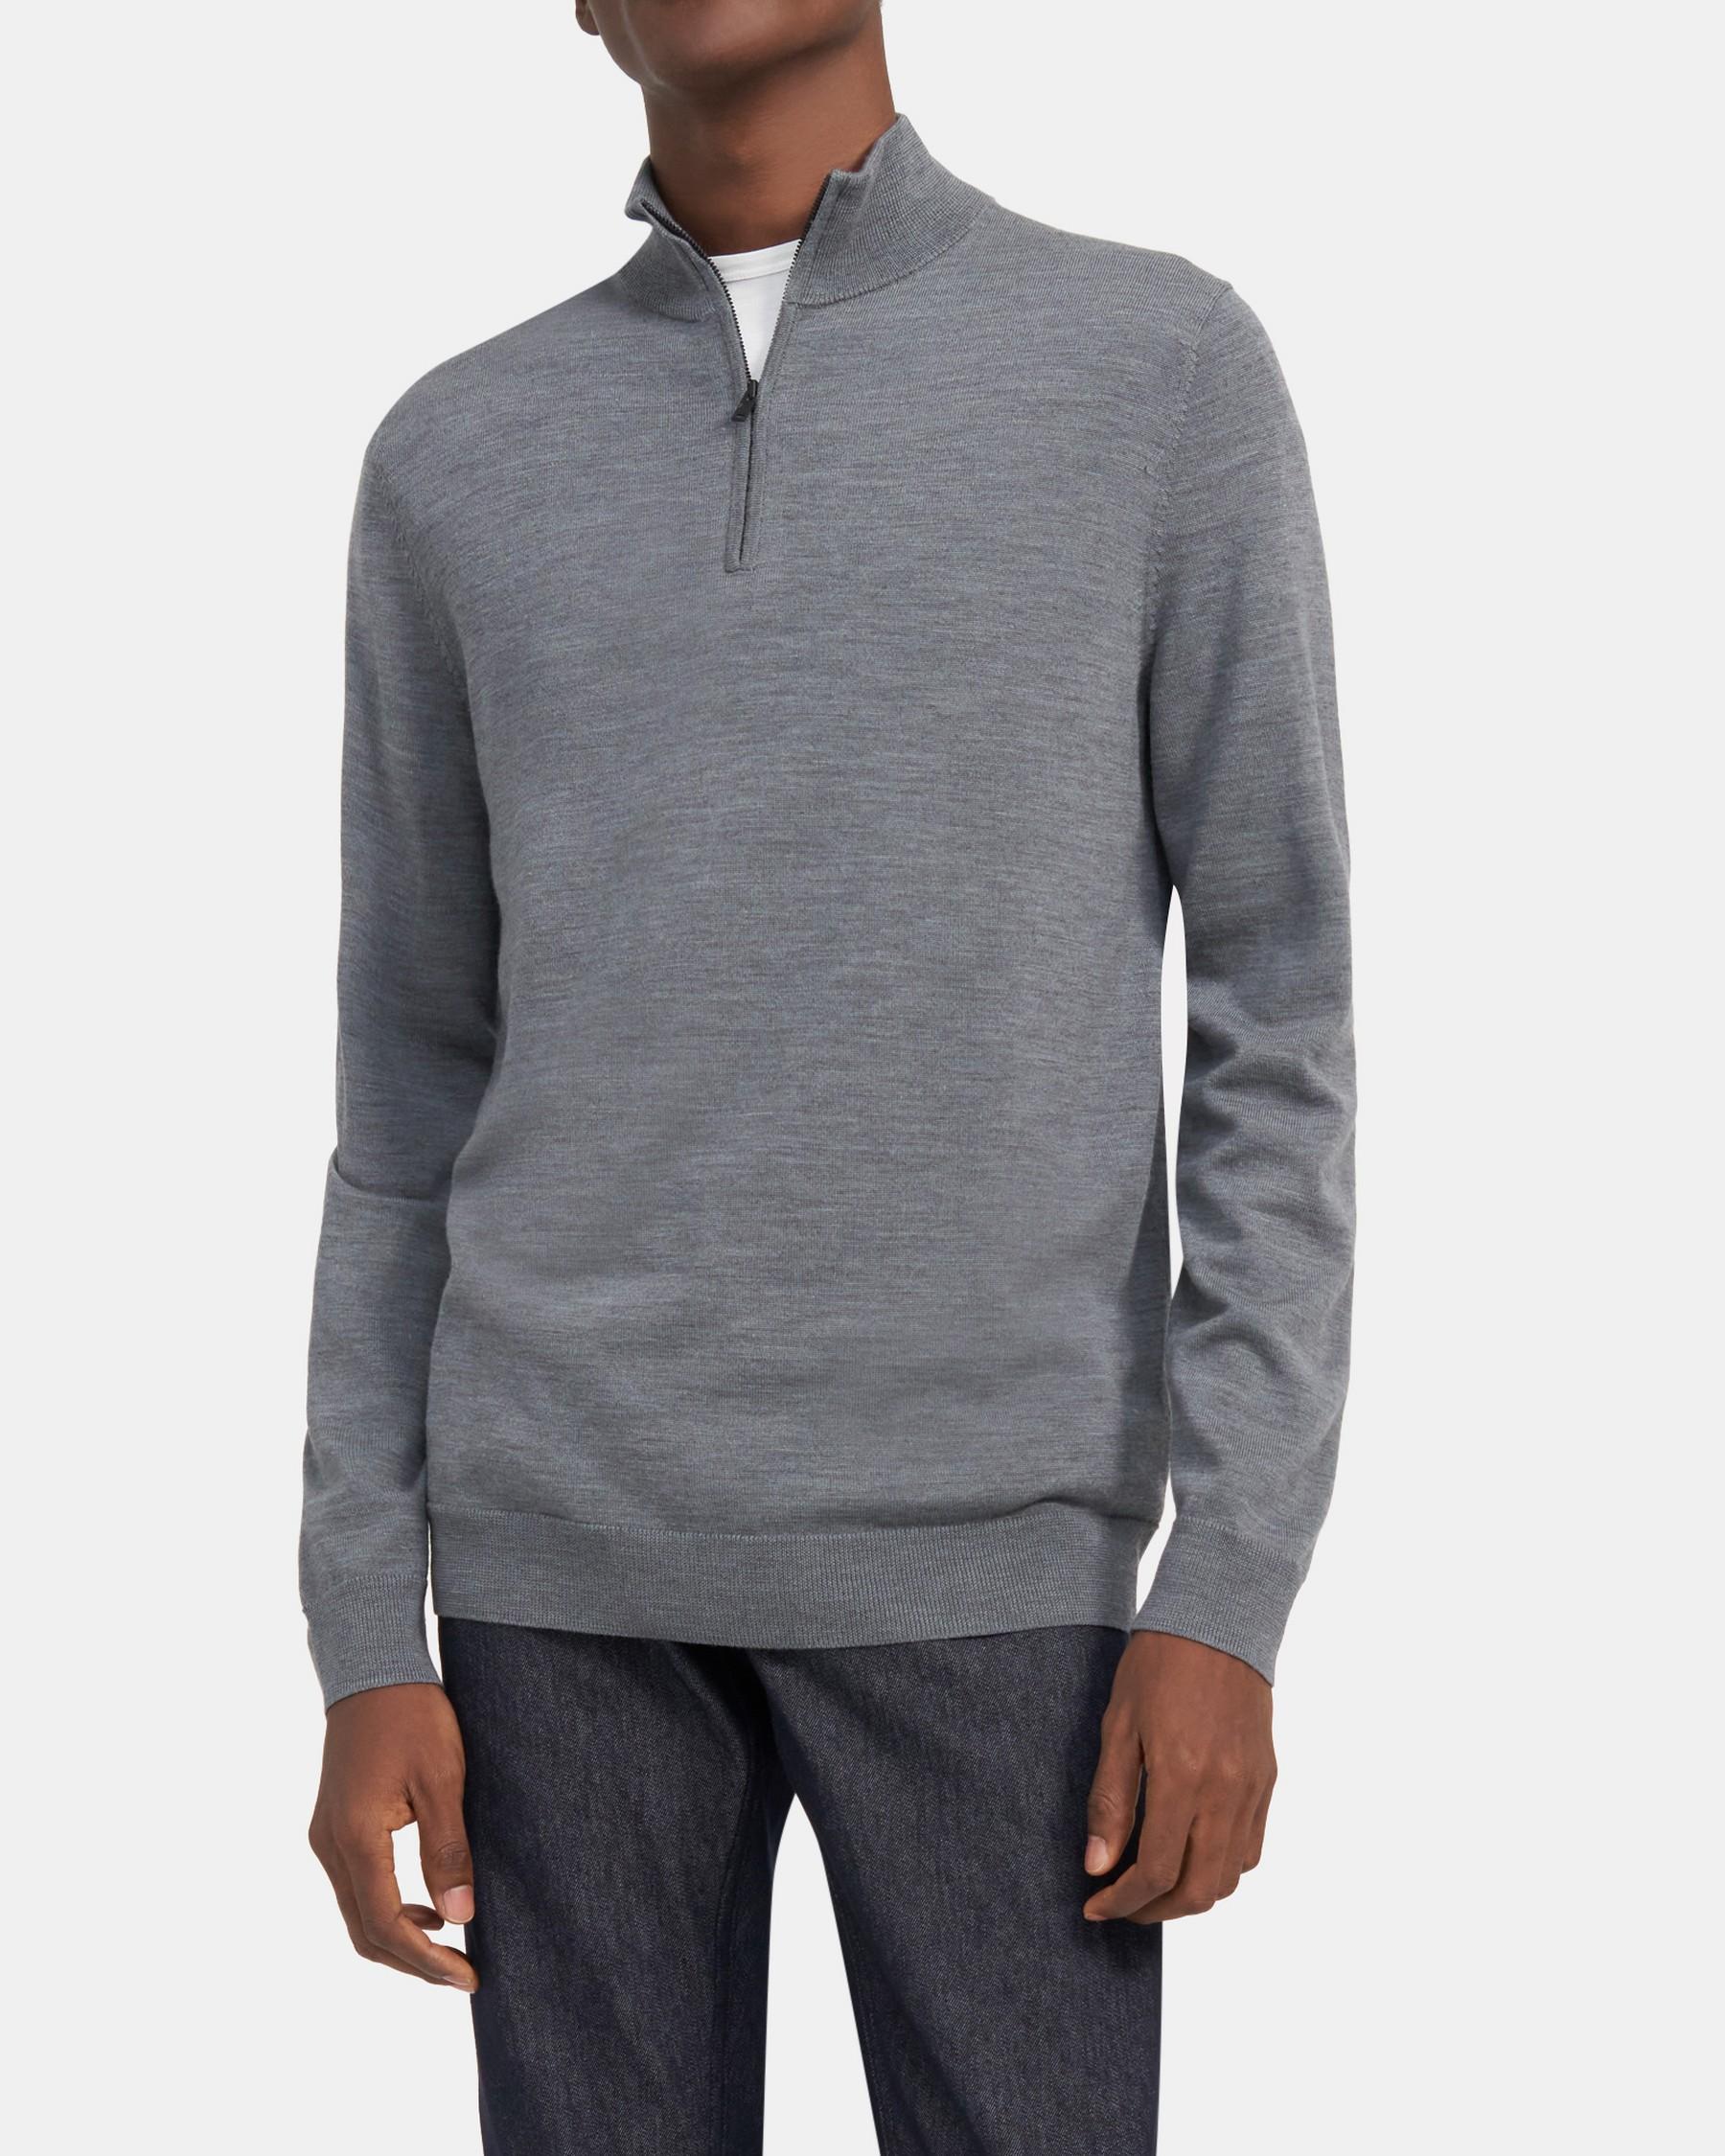 Theory Quarter-Zip Mockneck Sweater in Ace Wool